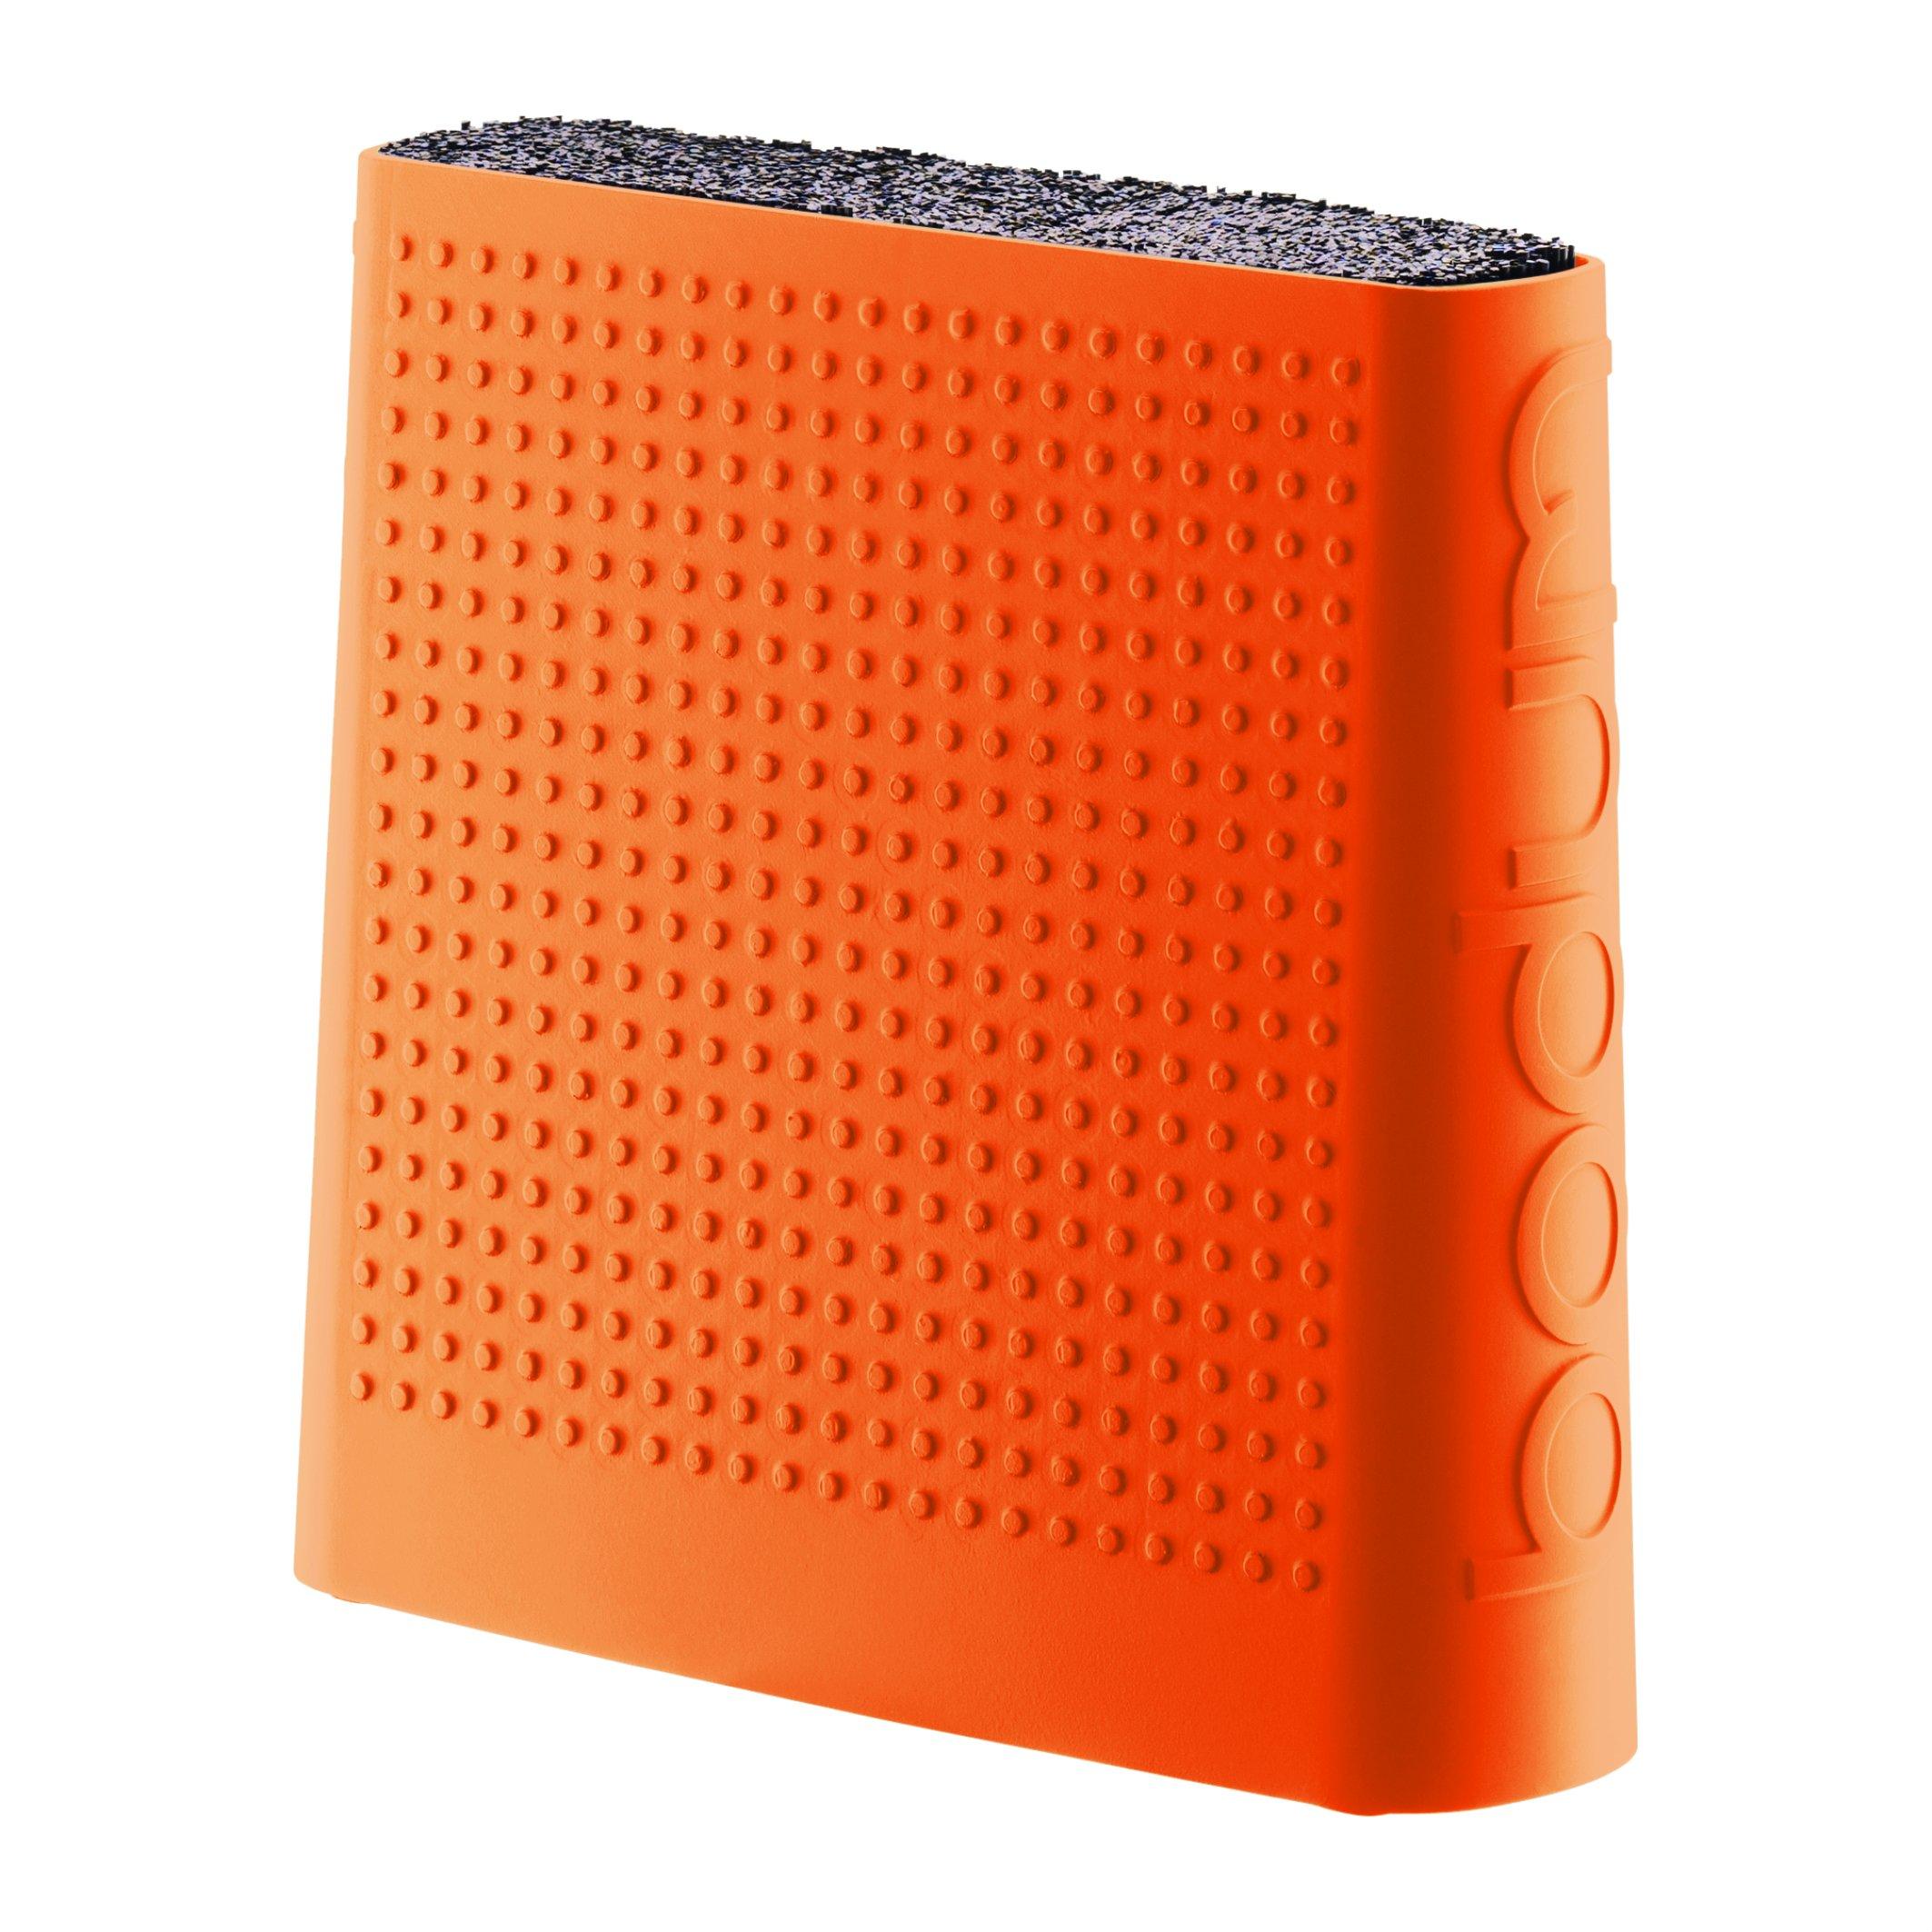 Bodum Bistro - Knife Holder Block - Non-Slip Feet - Plastic - Orange